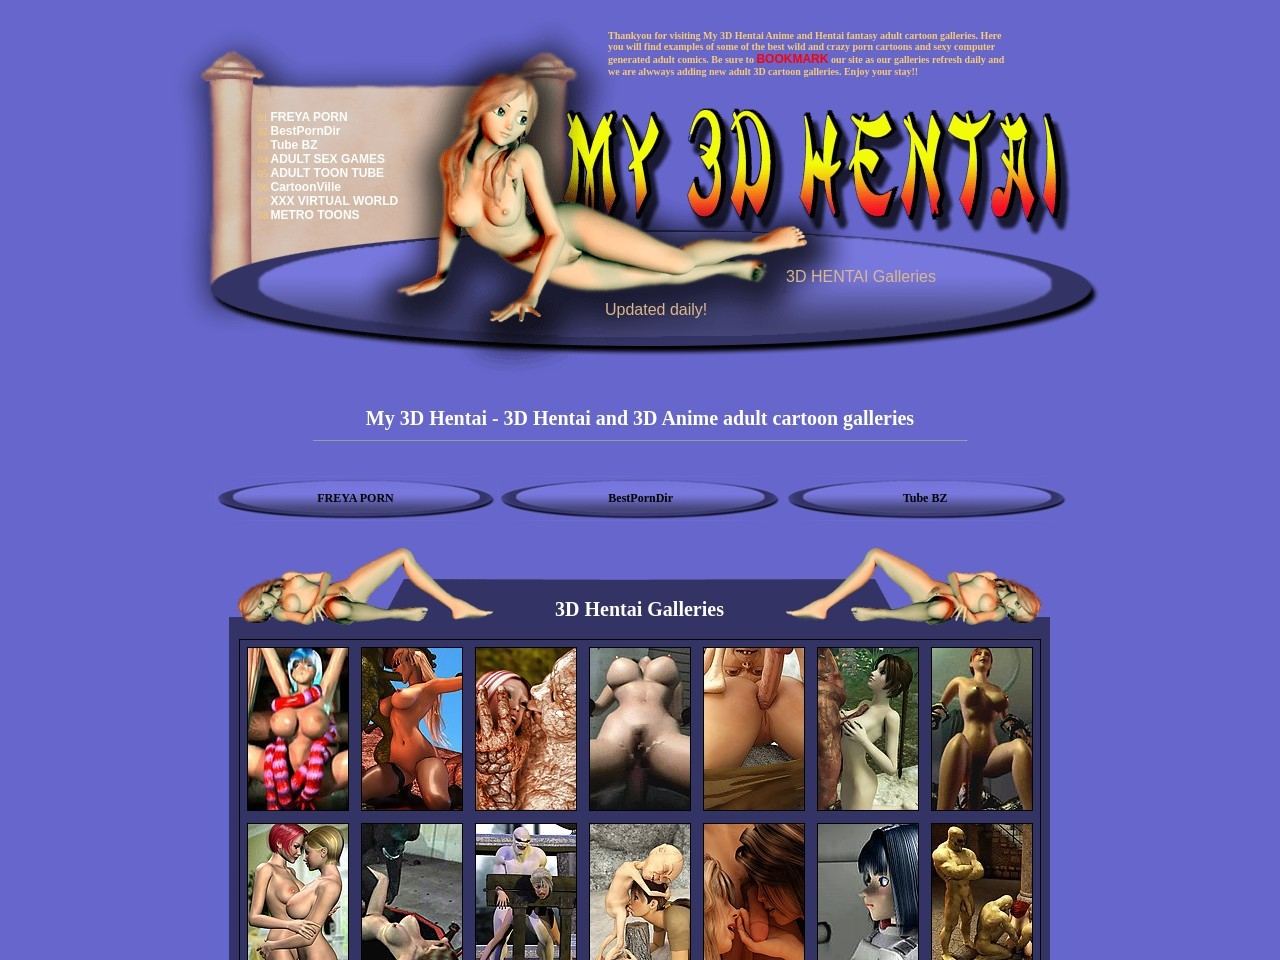 My 3D Hentai - 3D Anime and 3D Hentai adult cartoon porn galleries